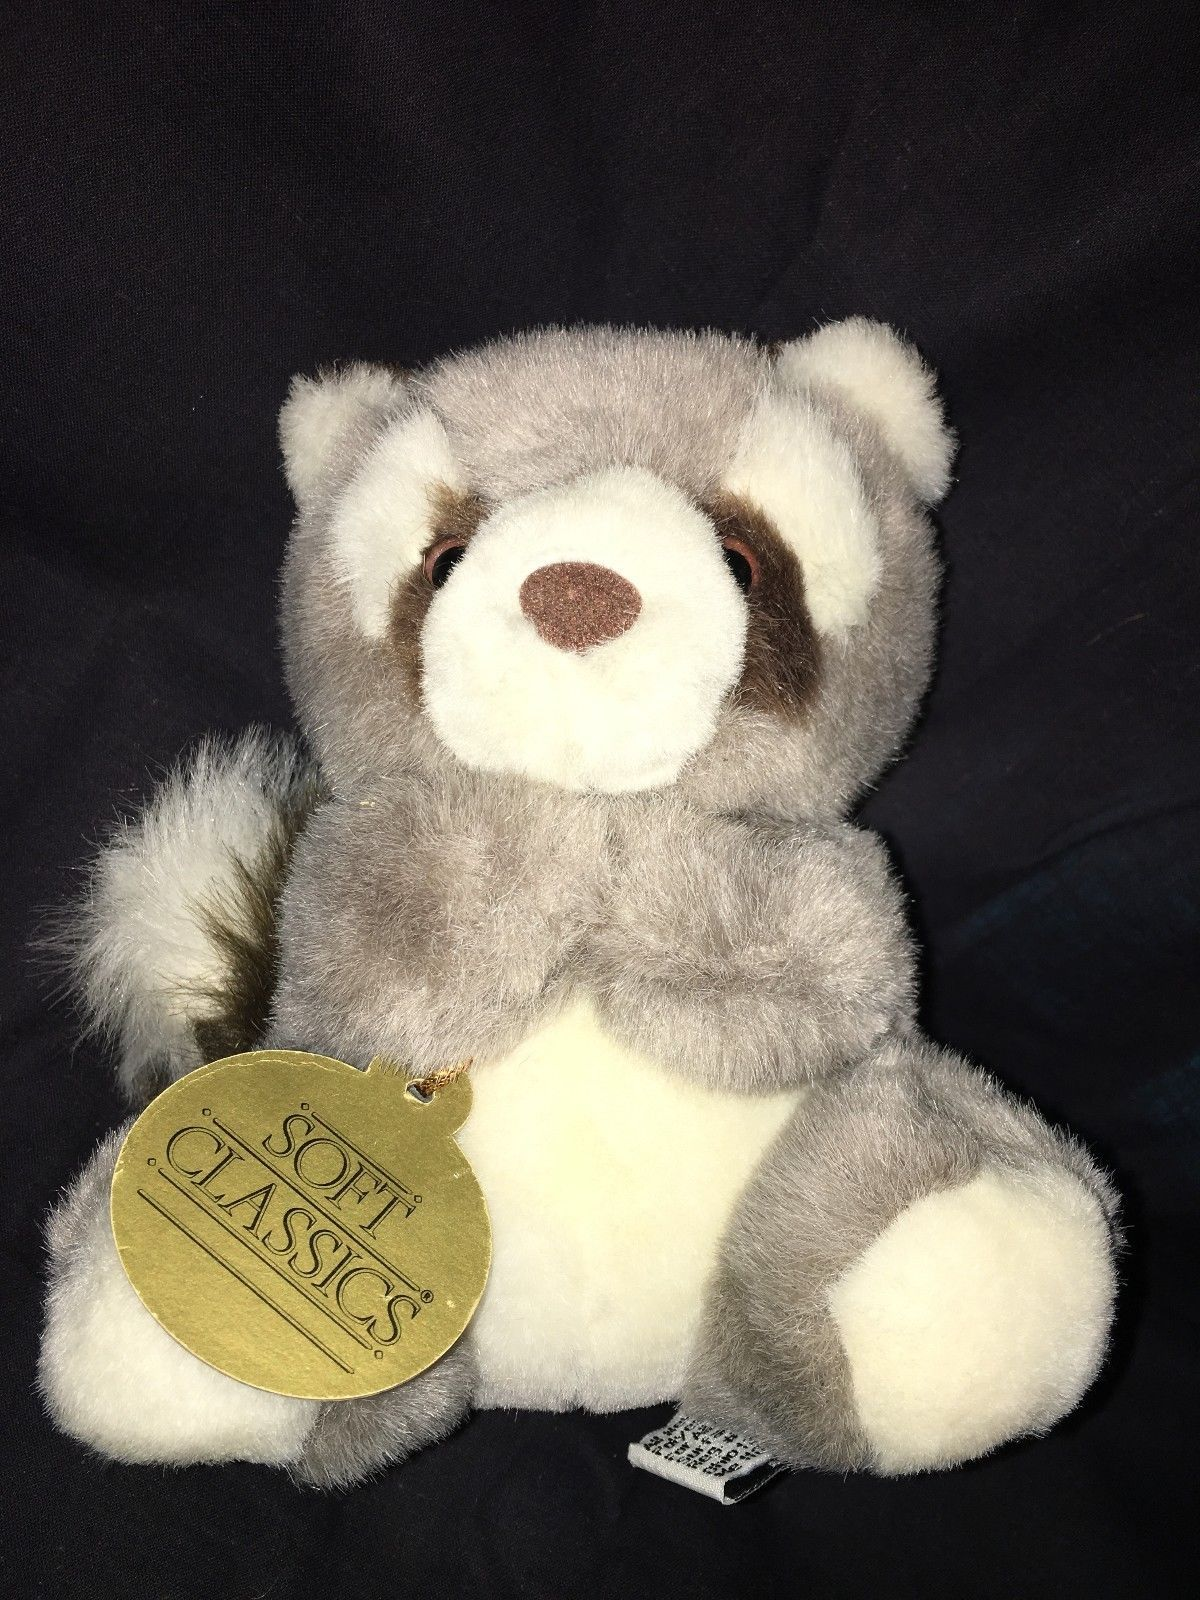 Baby Raccoon Red Panda Toys R Us Soft Classics Plush Stuffed Animal